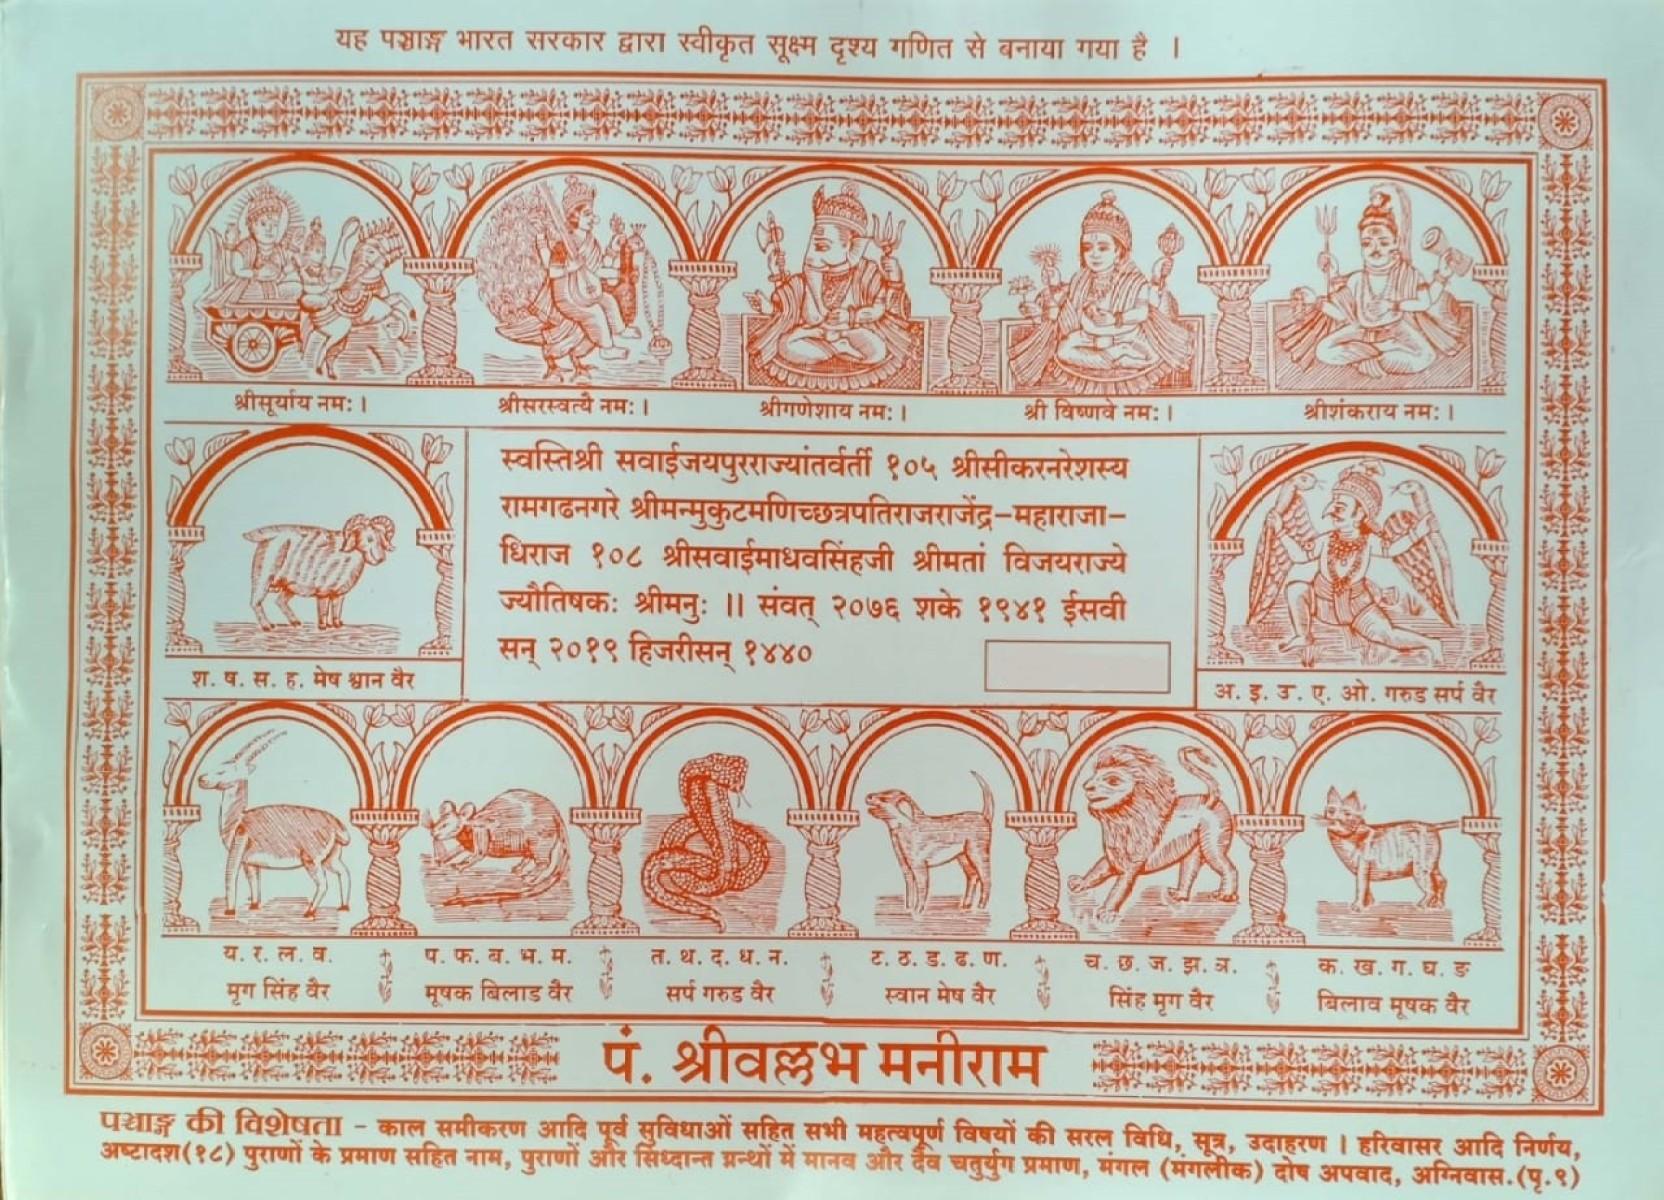 P  Shri Vallabh Maniram Panchangam 2076 Samvat (2019- 20